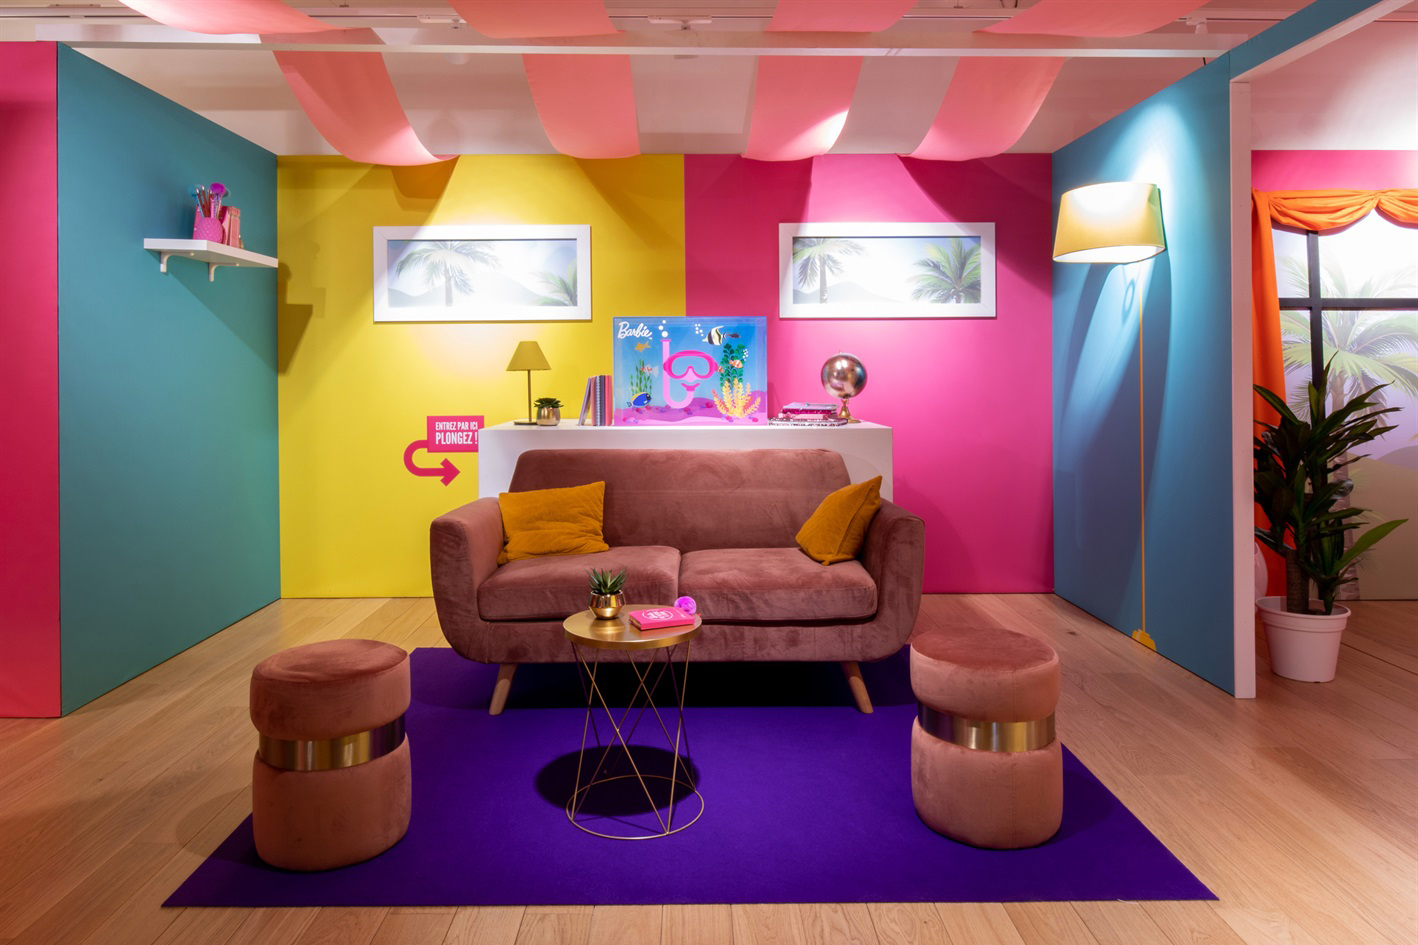 Apre Il Barbie Pop Up Store Alle Galeries Lafayette Di Parigi Popuppens